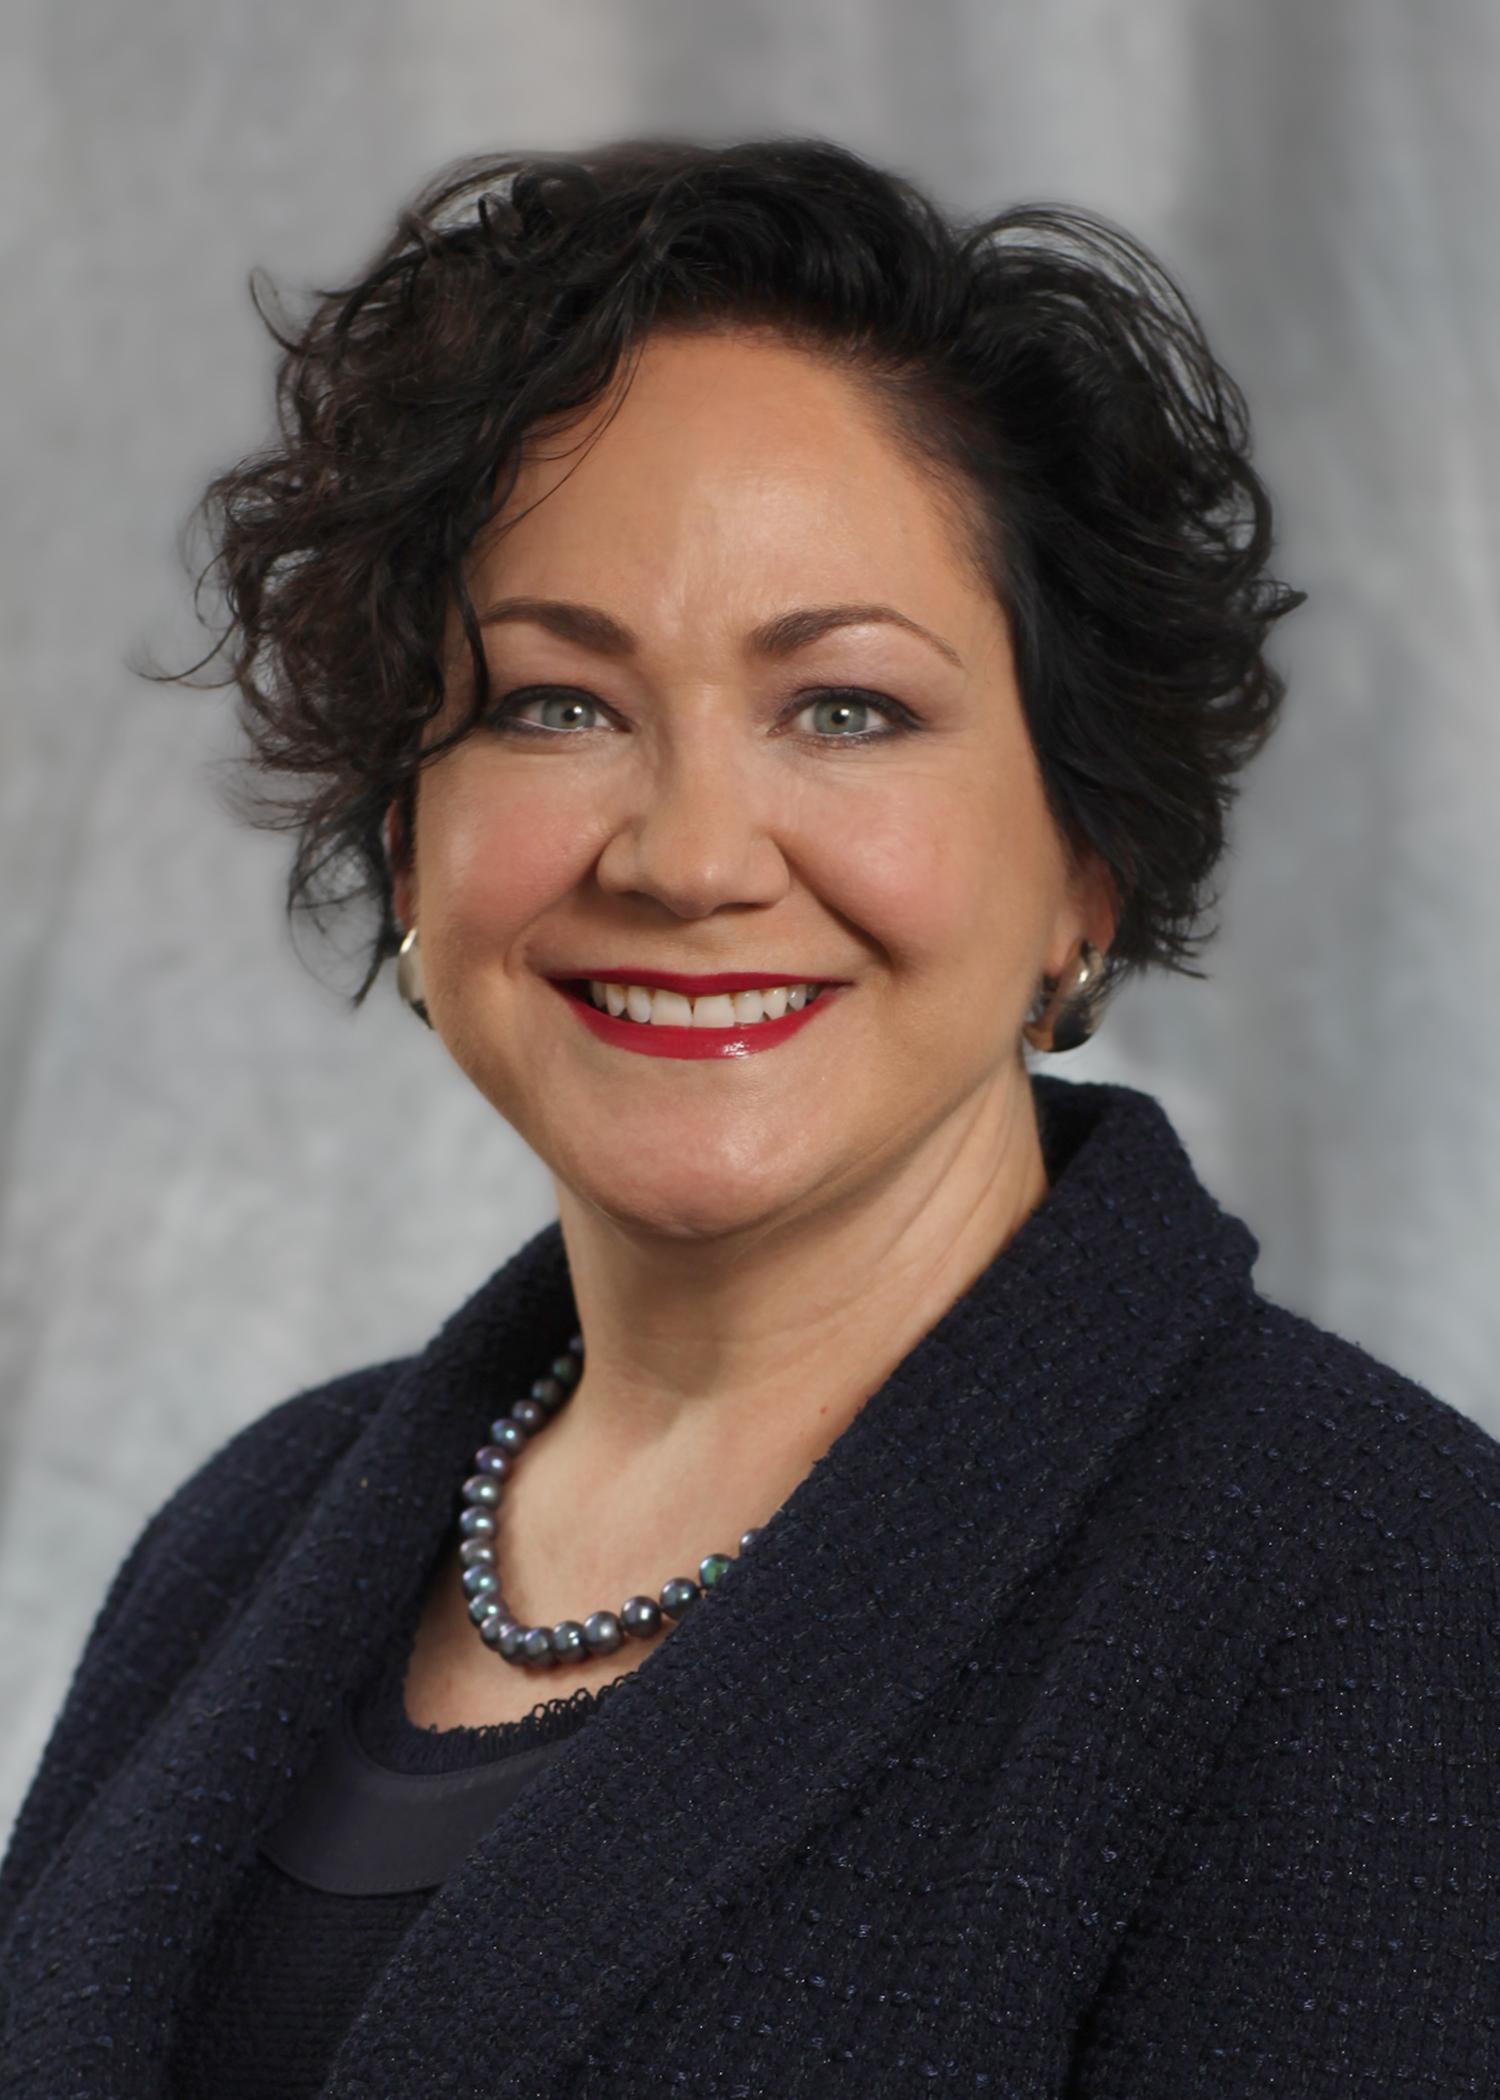 Suzanne Alwan